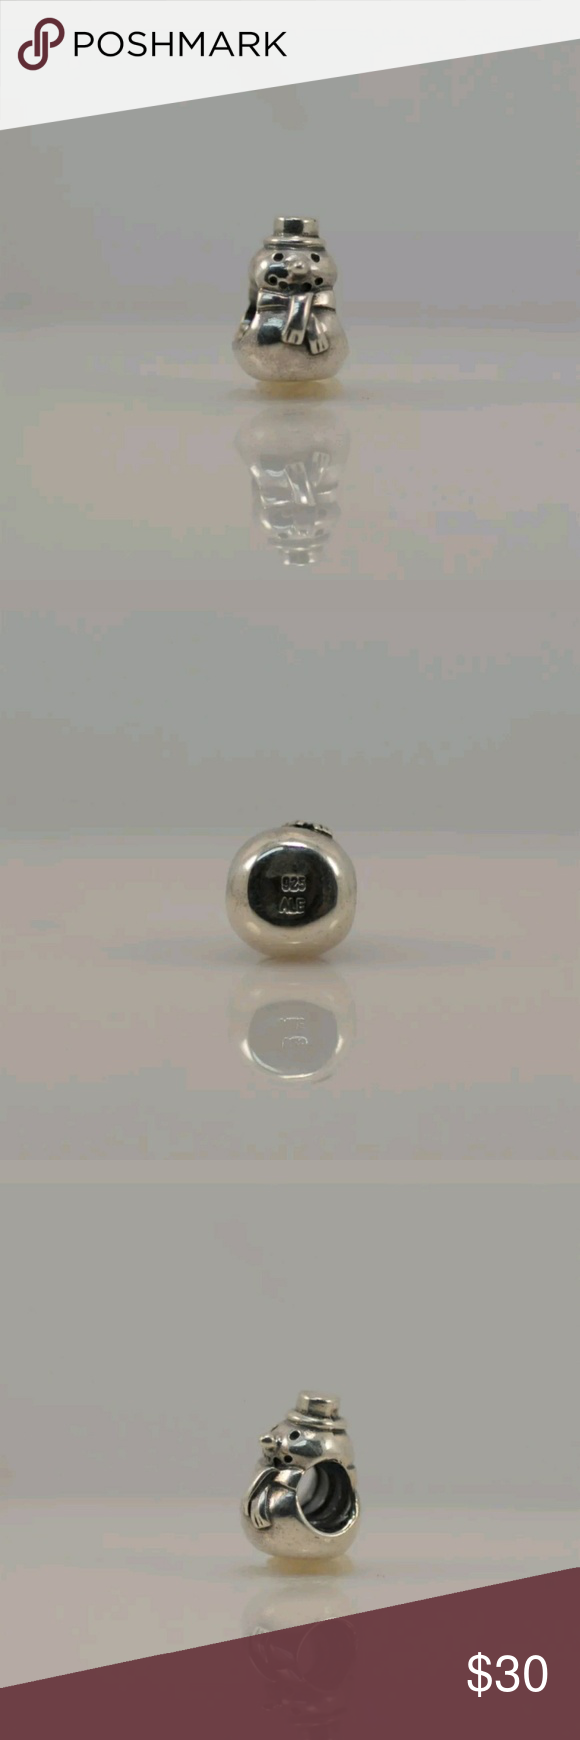 Retired Pandora Snowman Charm 790374 Authentic Retired